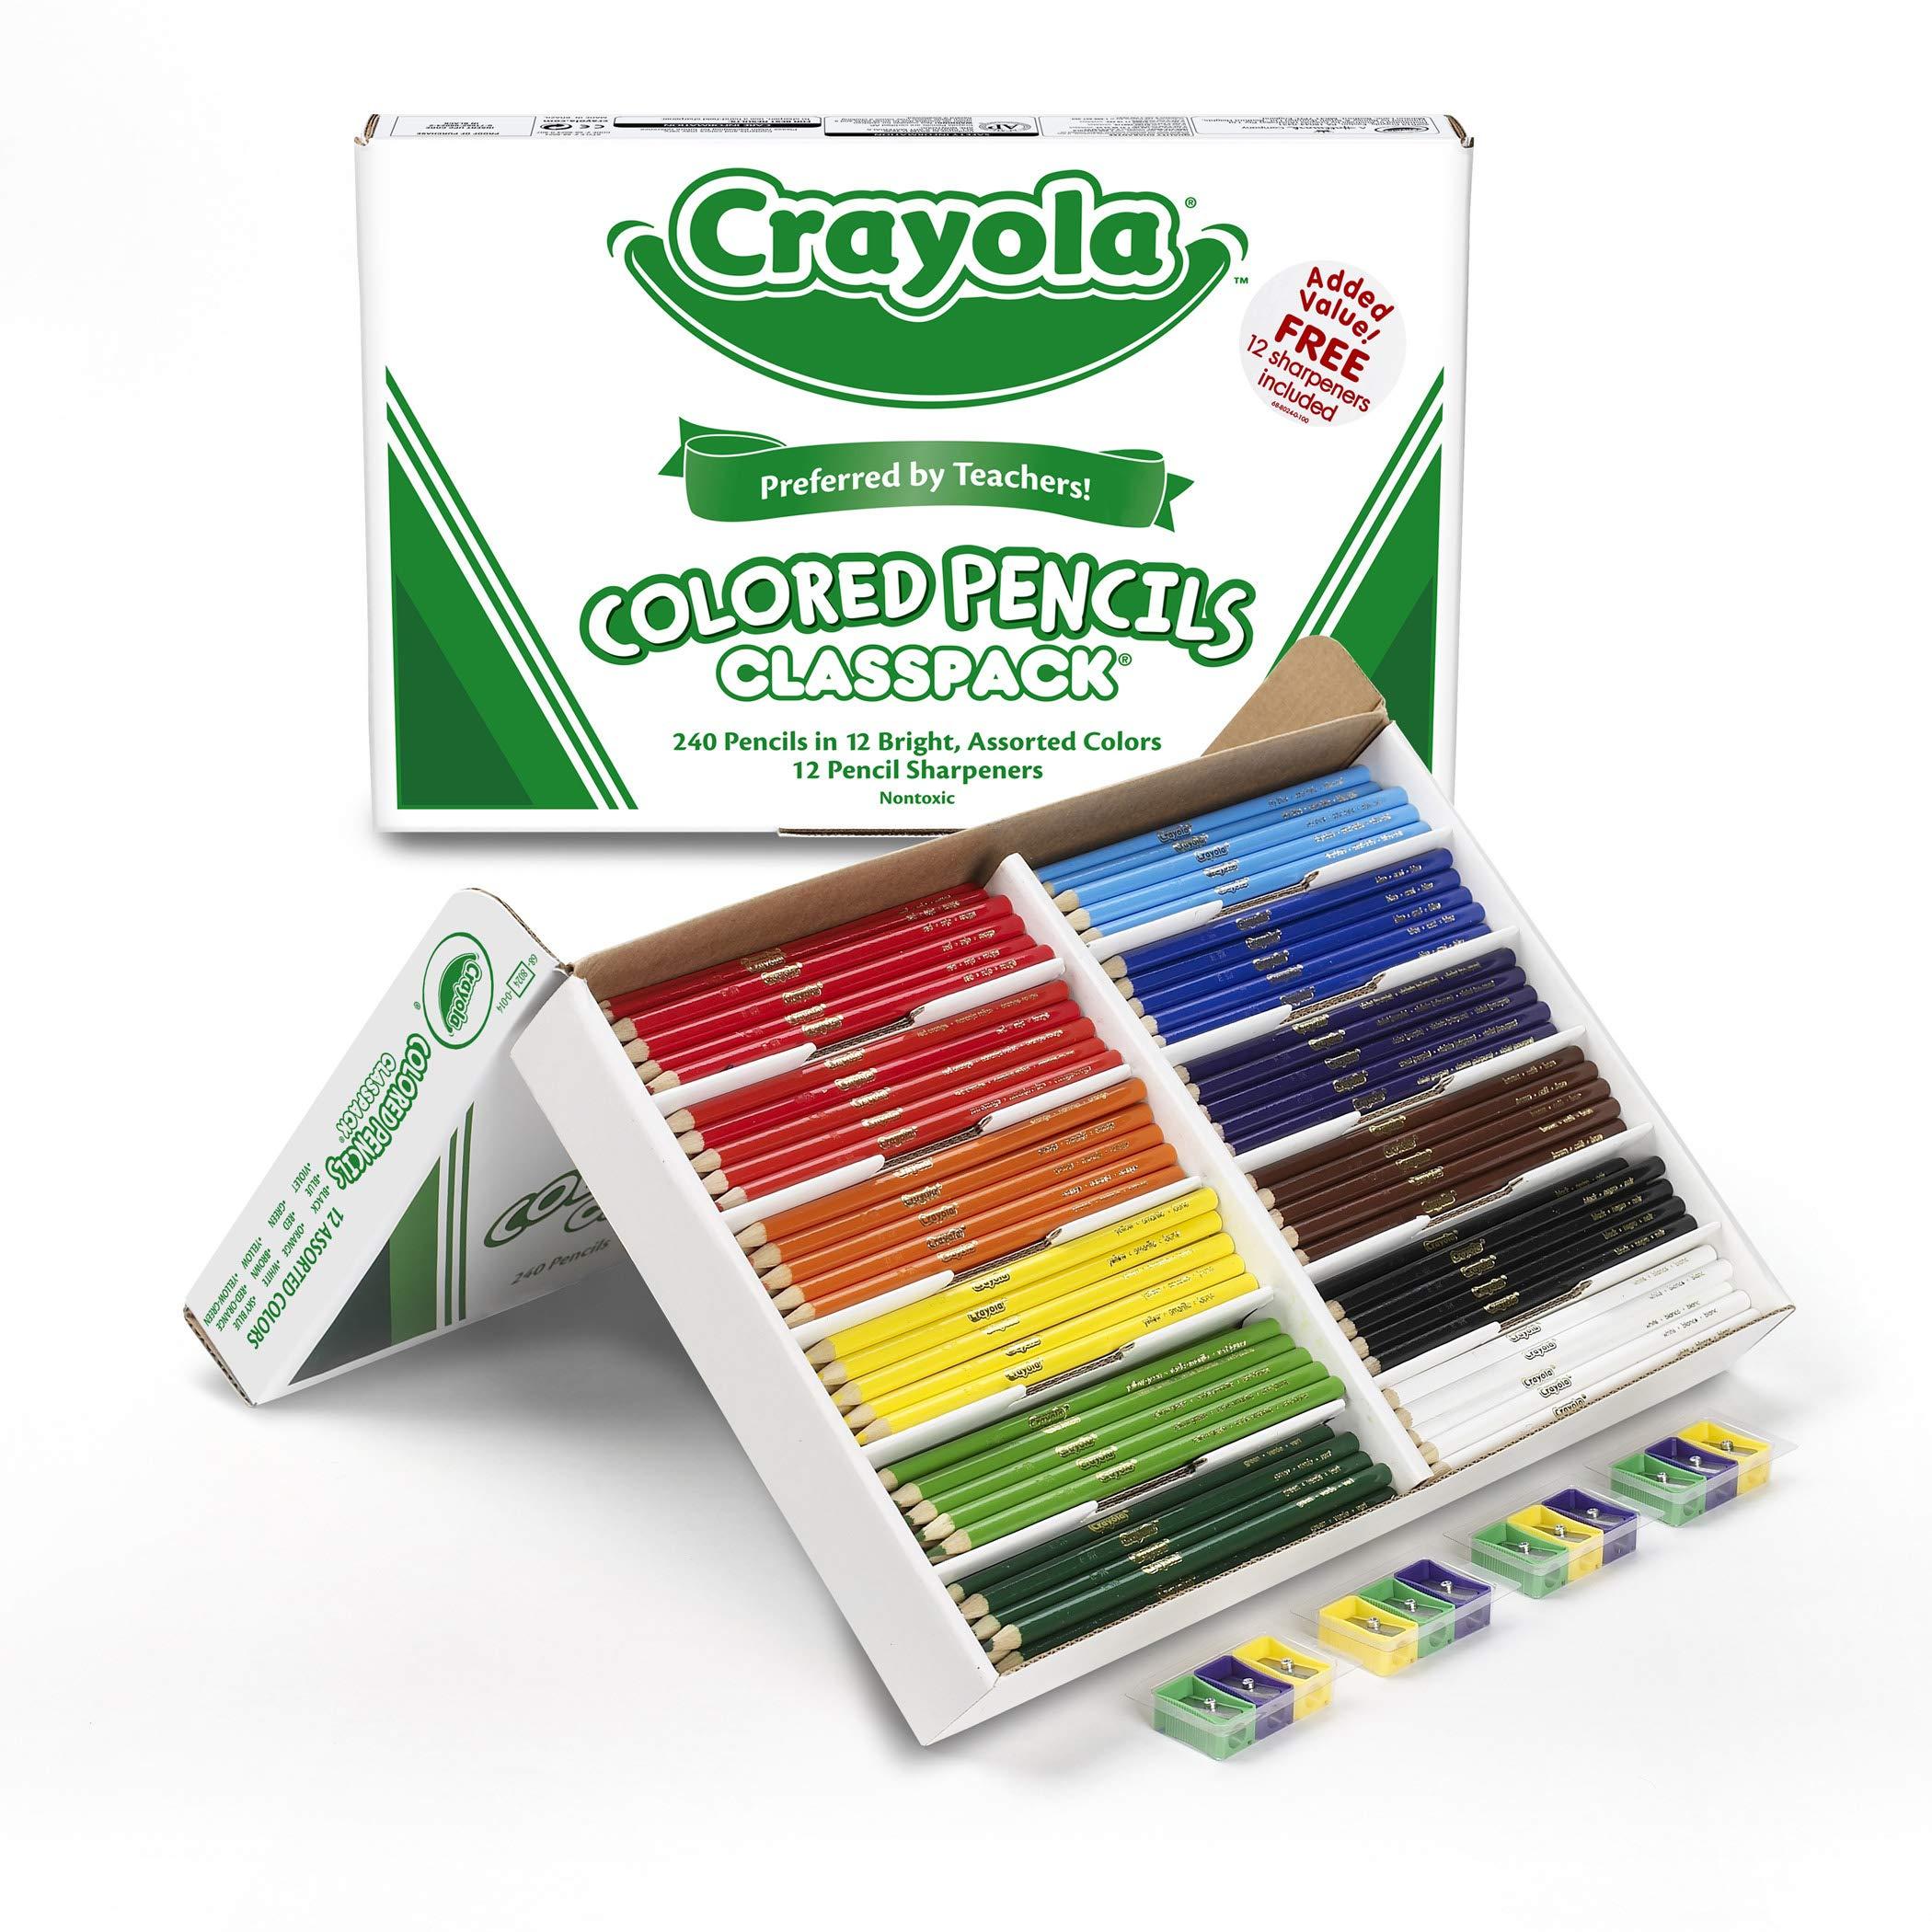 Crayola Colored Pencil Classpack Assorted